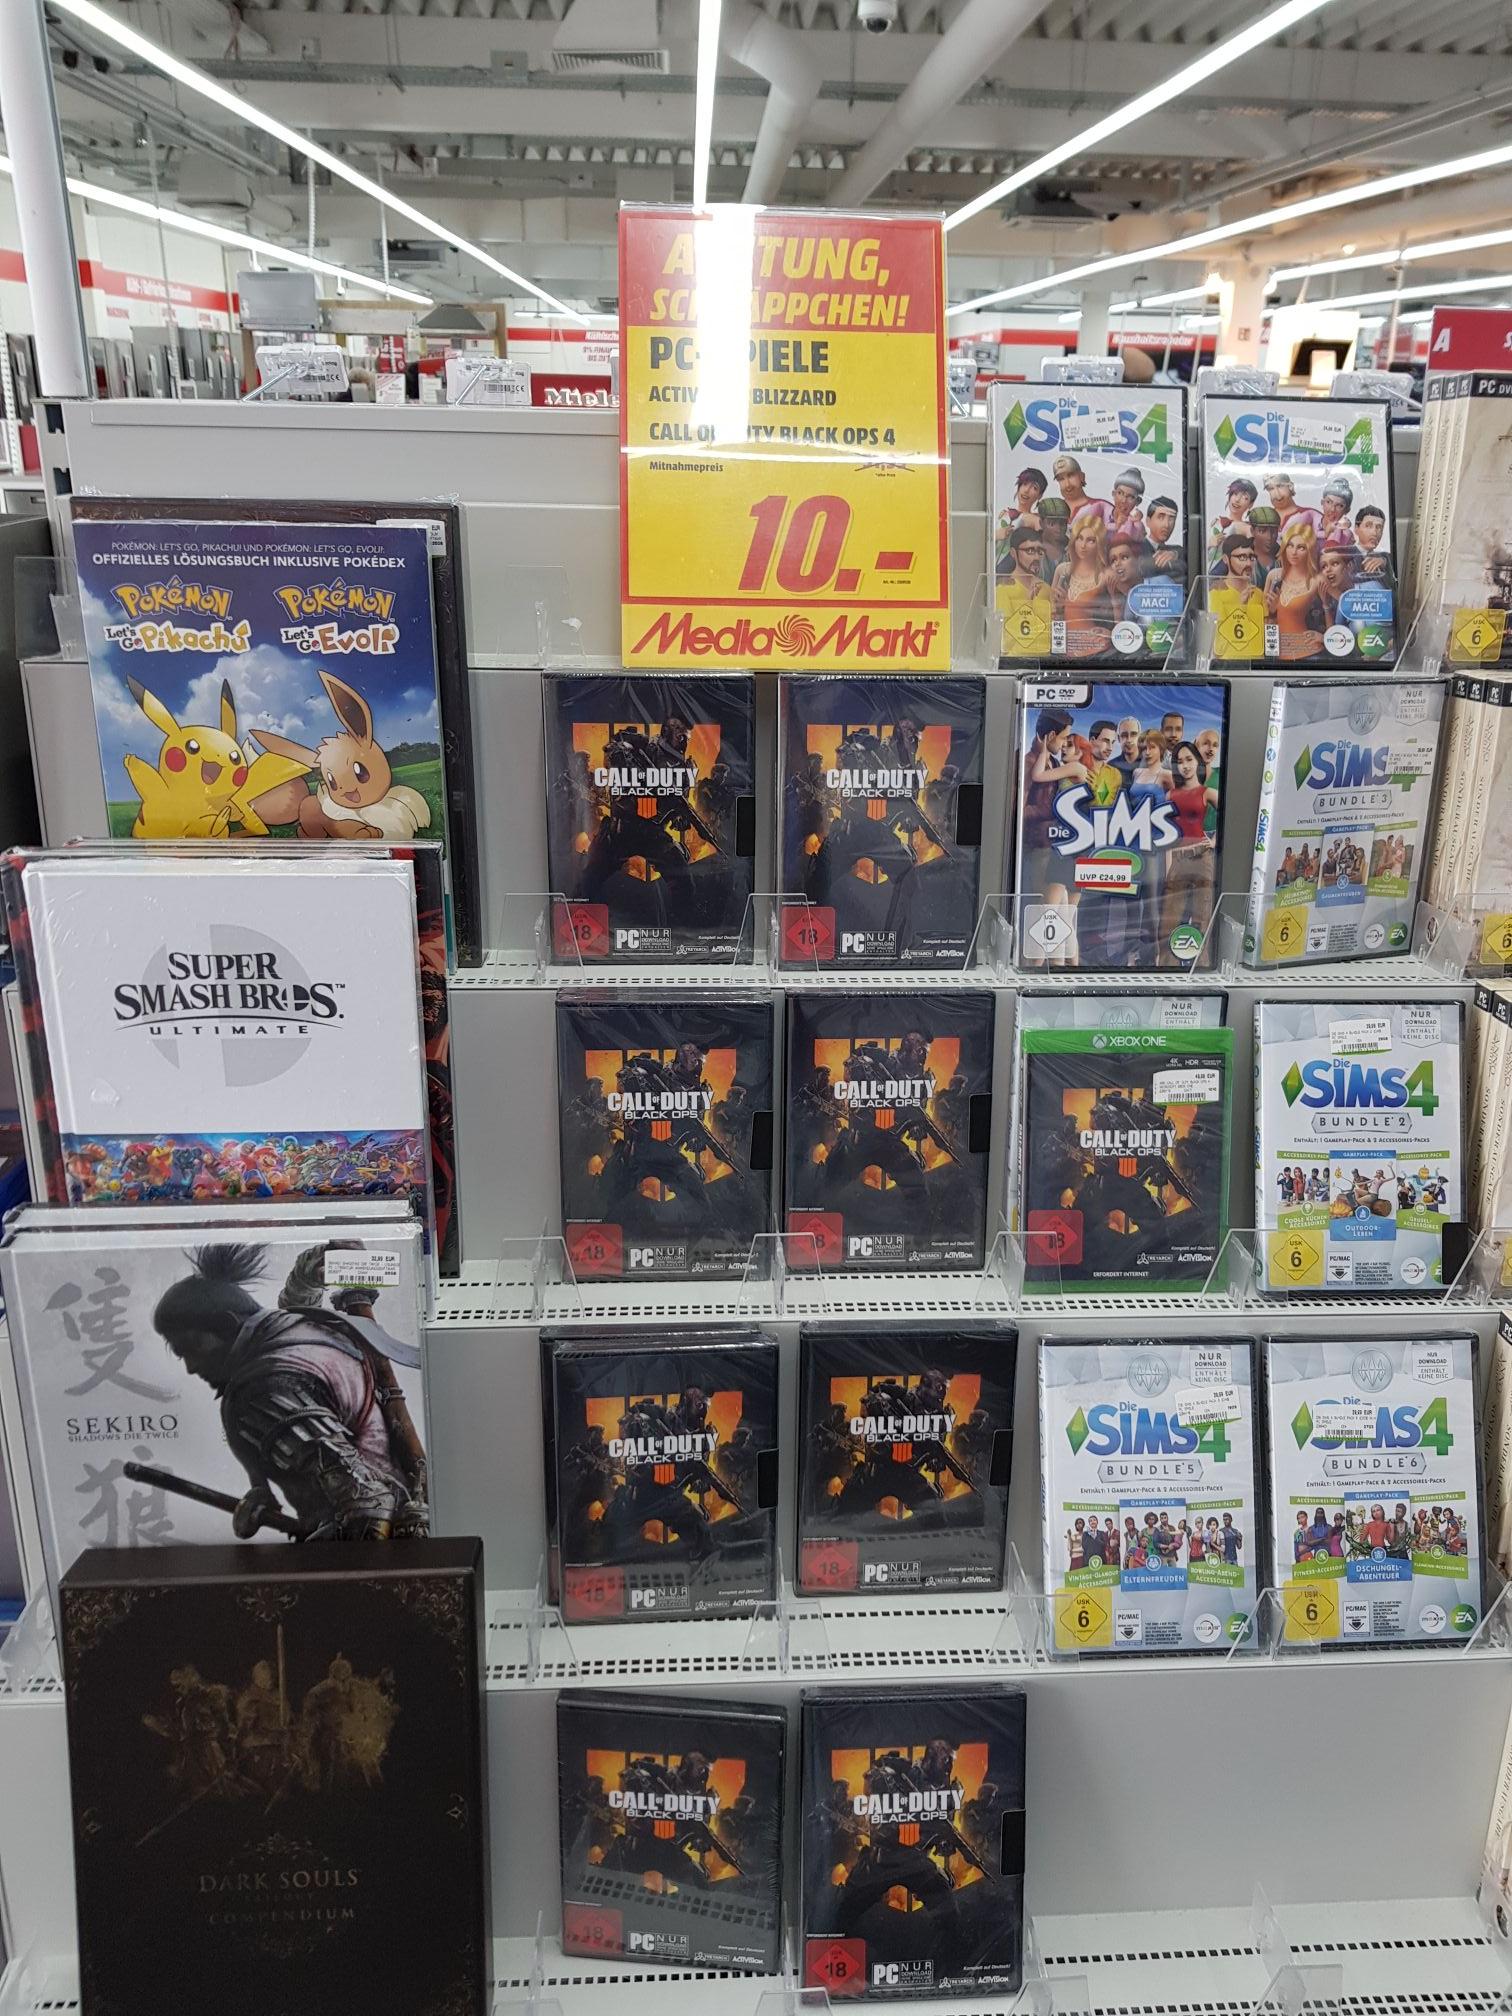 Call of Duty Black Ops 4 Pc (lokal Hildesheim)